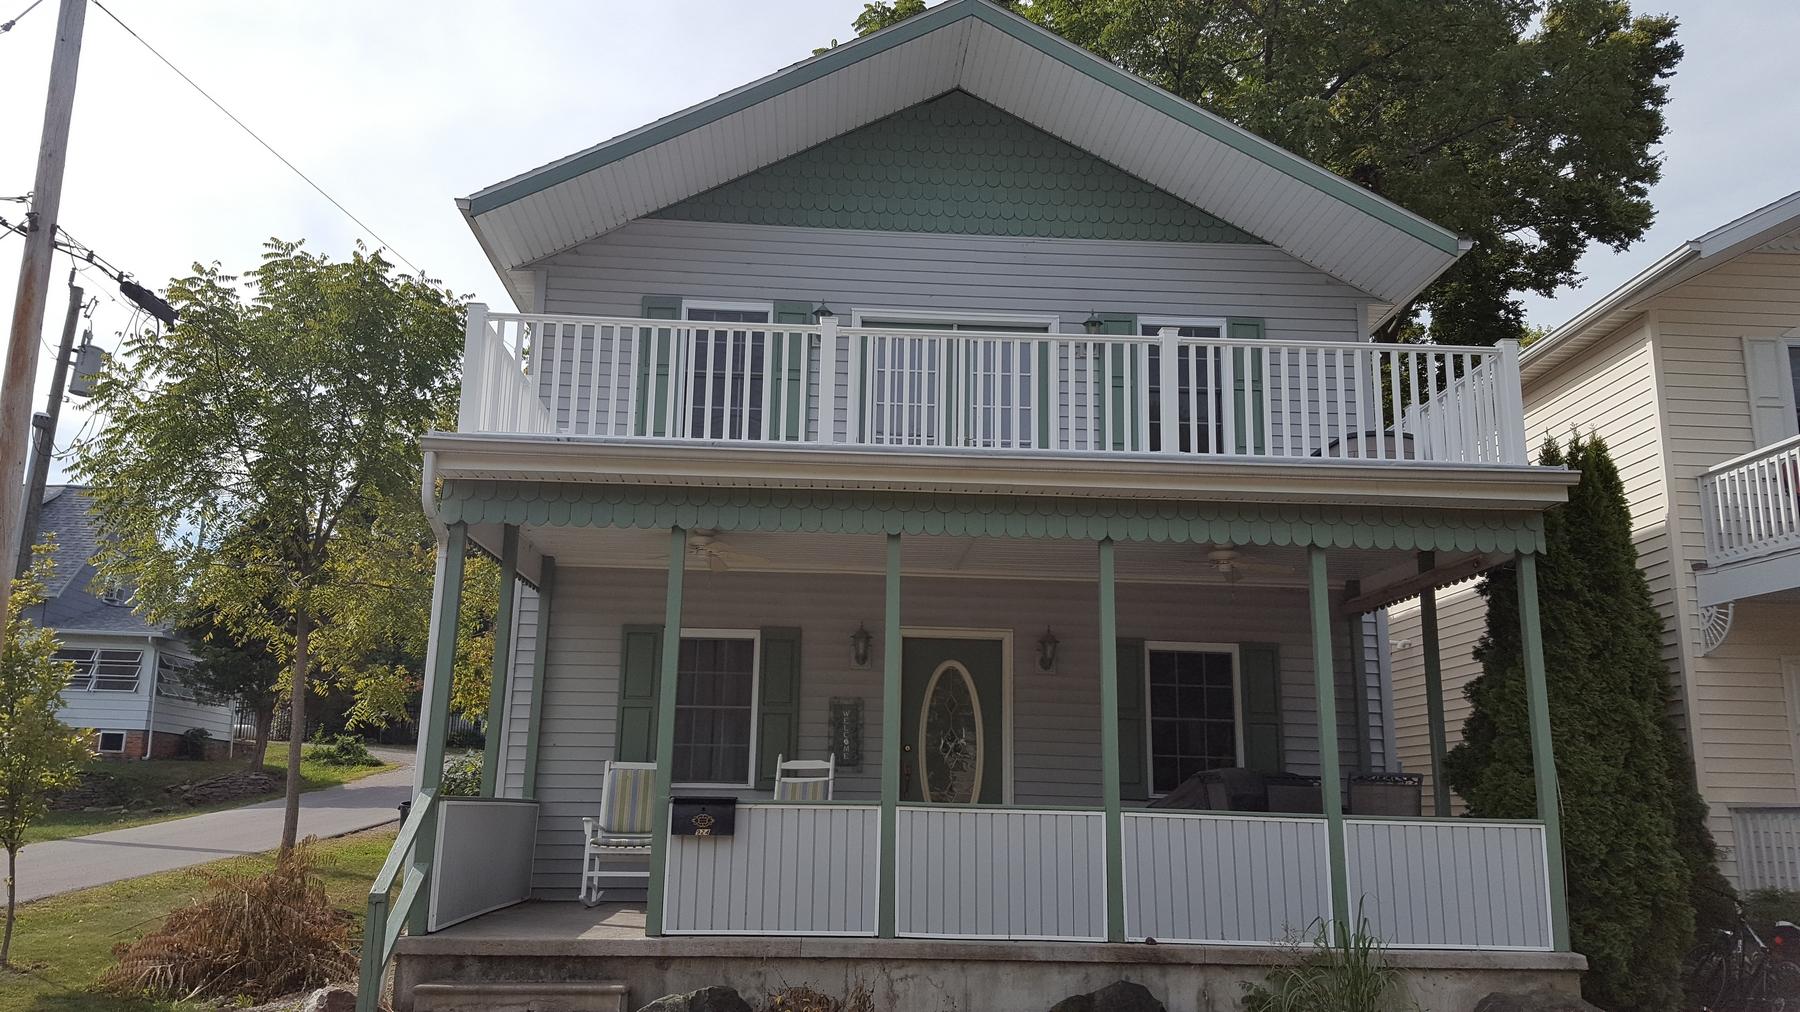 Single Family Home for Sale at 924 E. Sixth St. Lakeside, Ohio 43440 United States